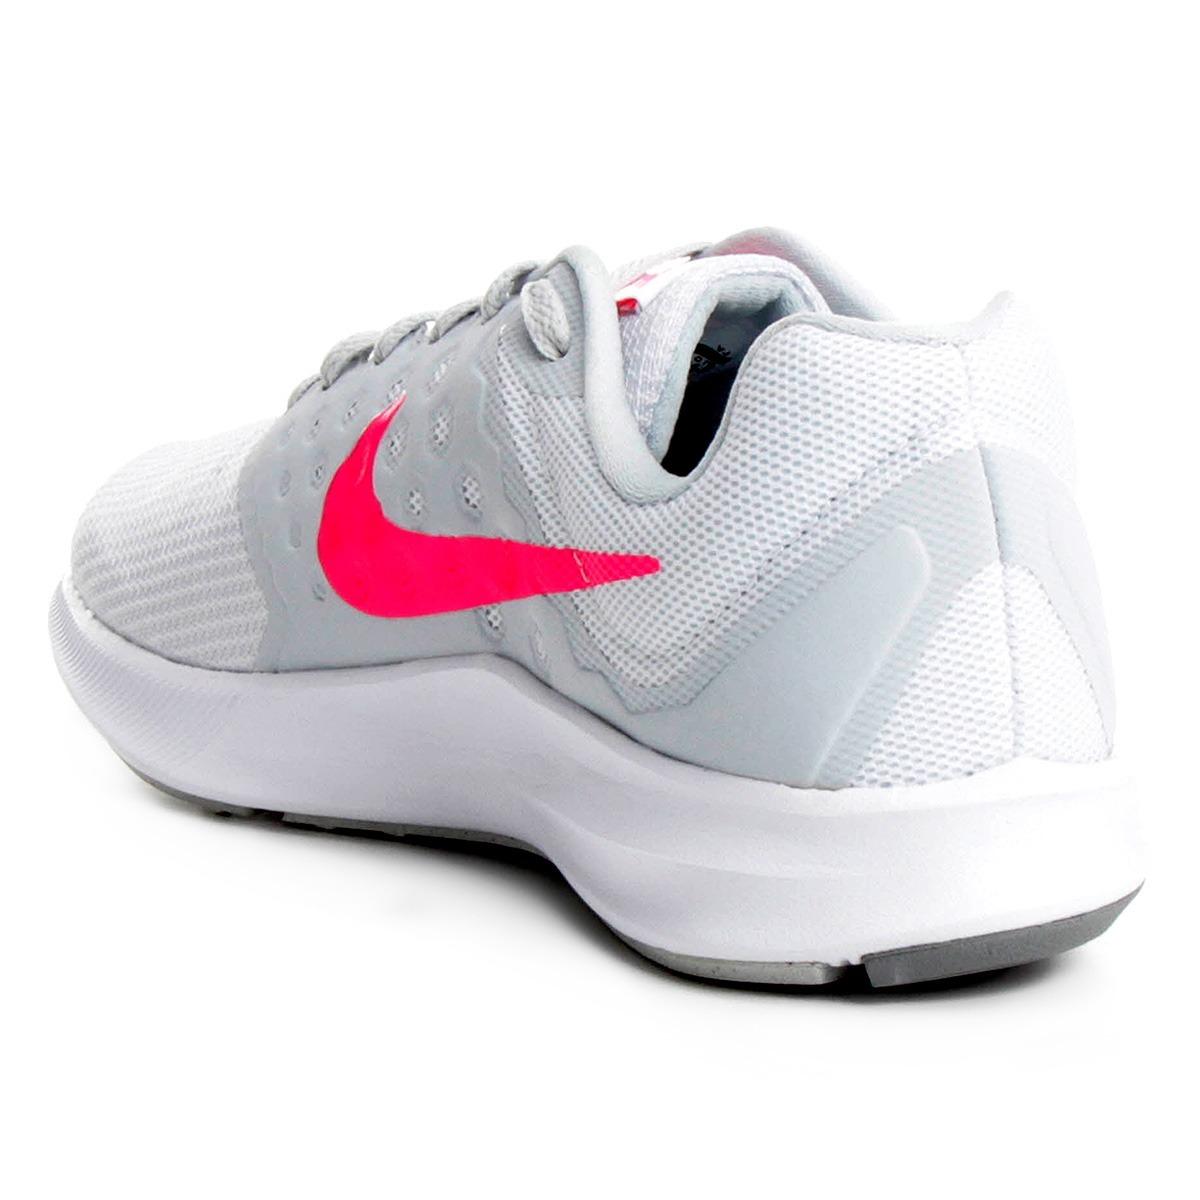 Tenis Nike Feminino Downshifter 7 Bcocinzarosa